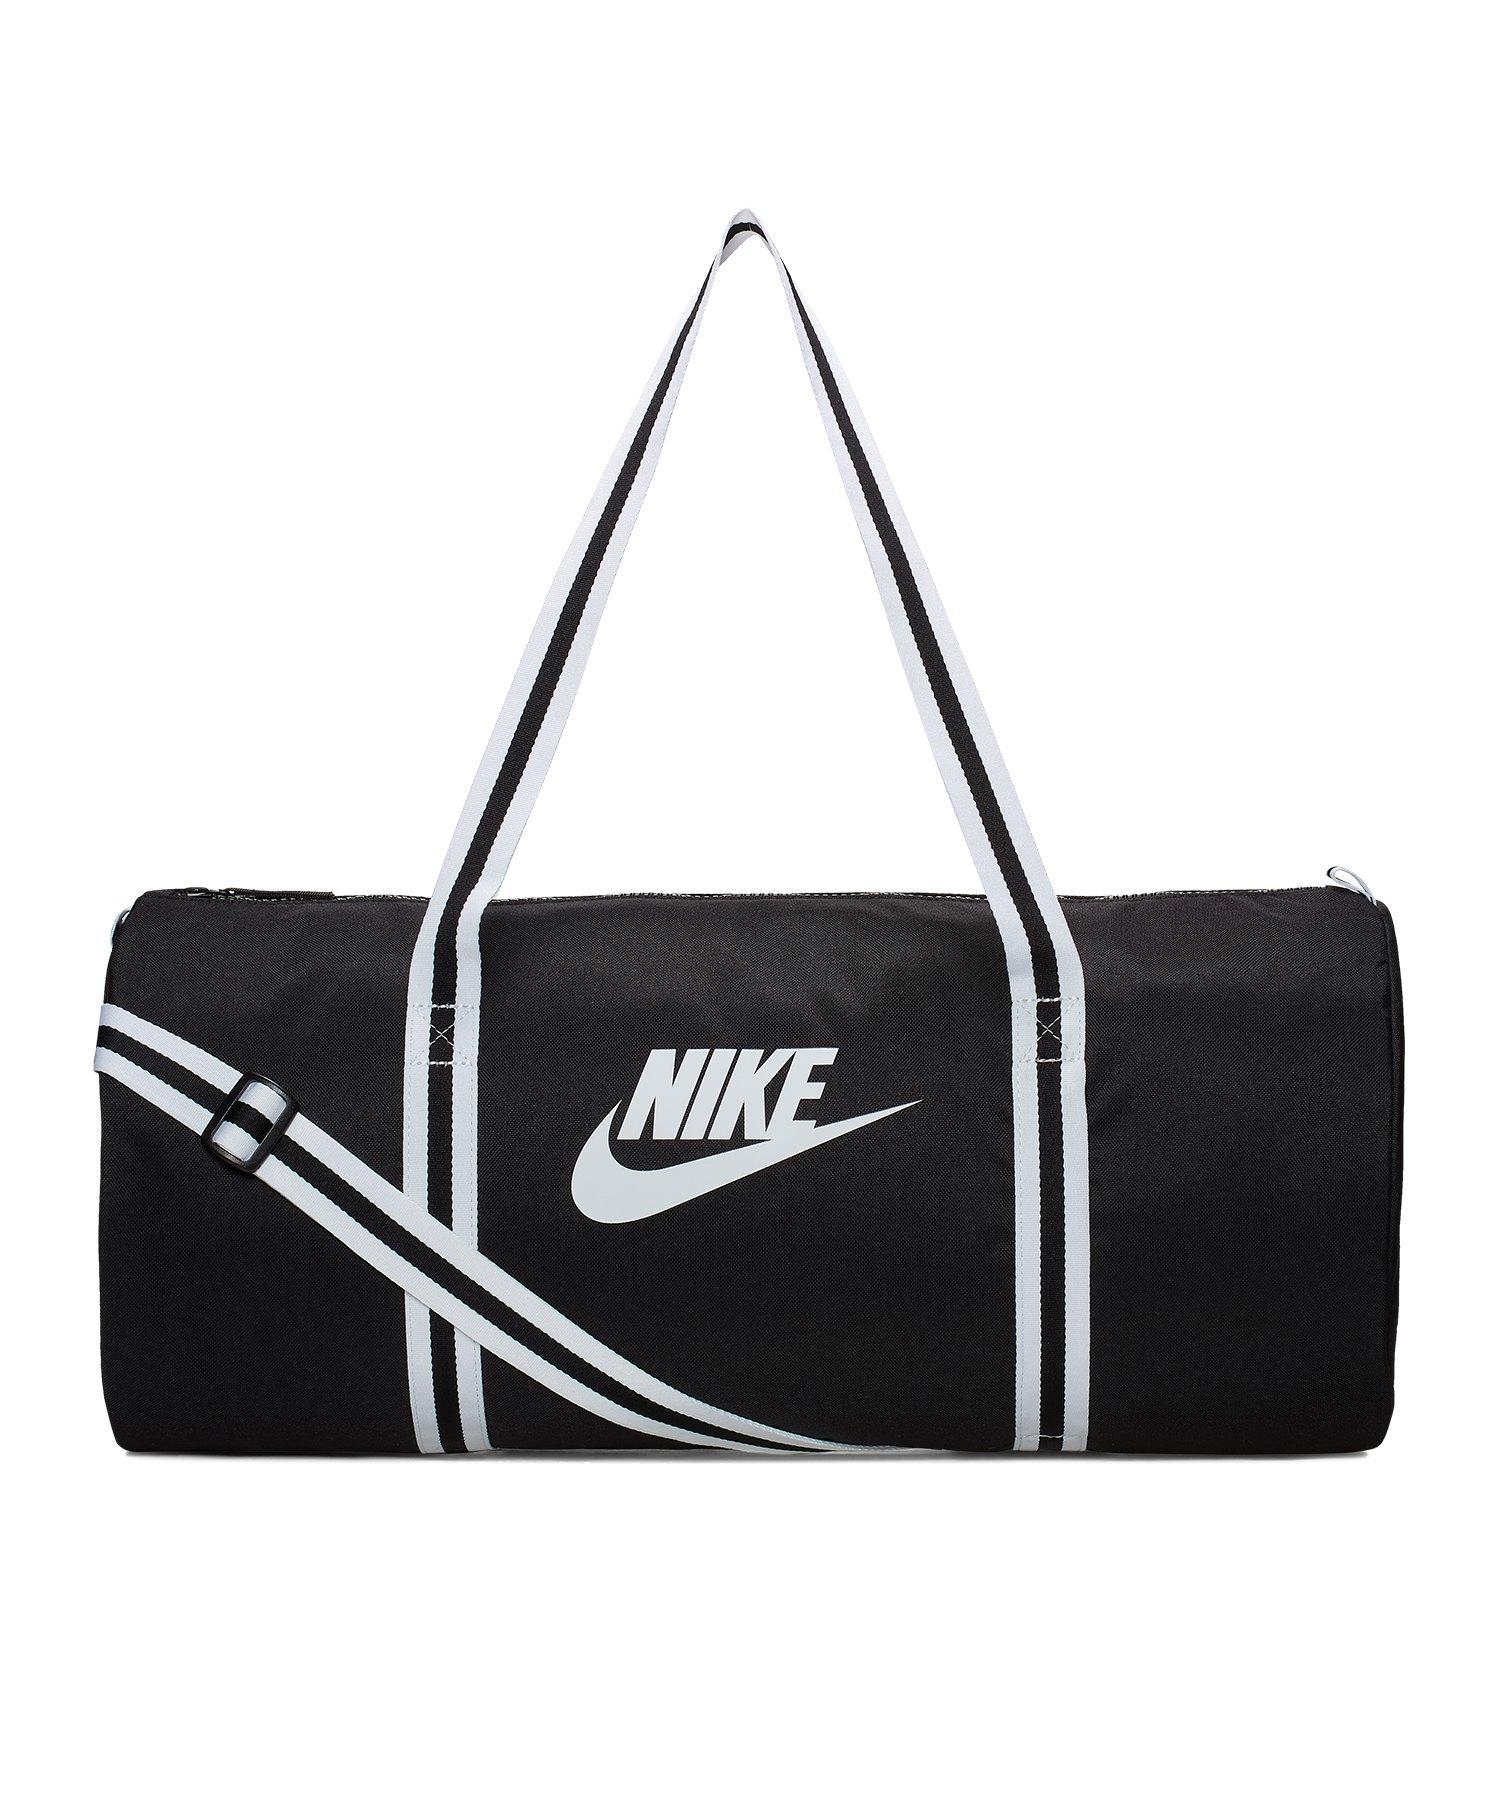 Nike Heritage Duffle Bag Schwarz F010 - schwarz